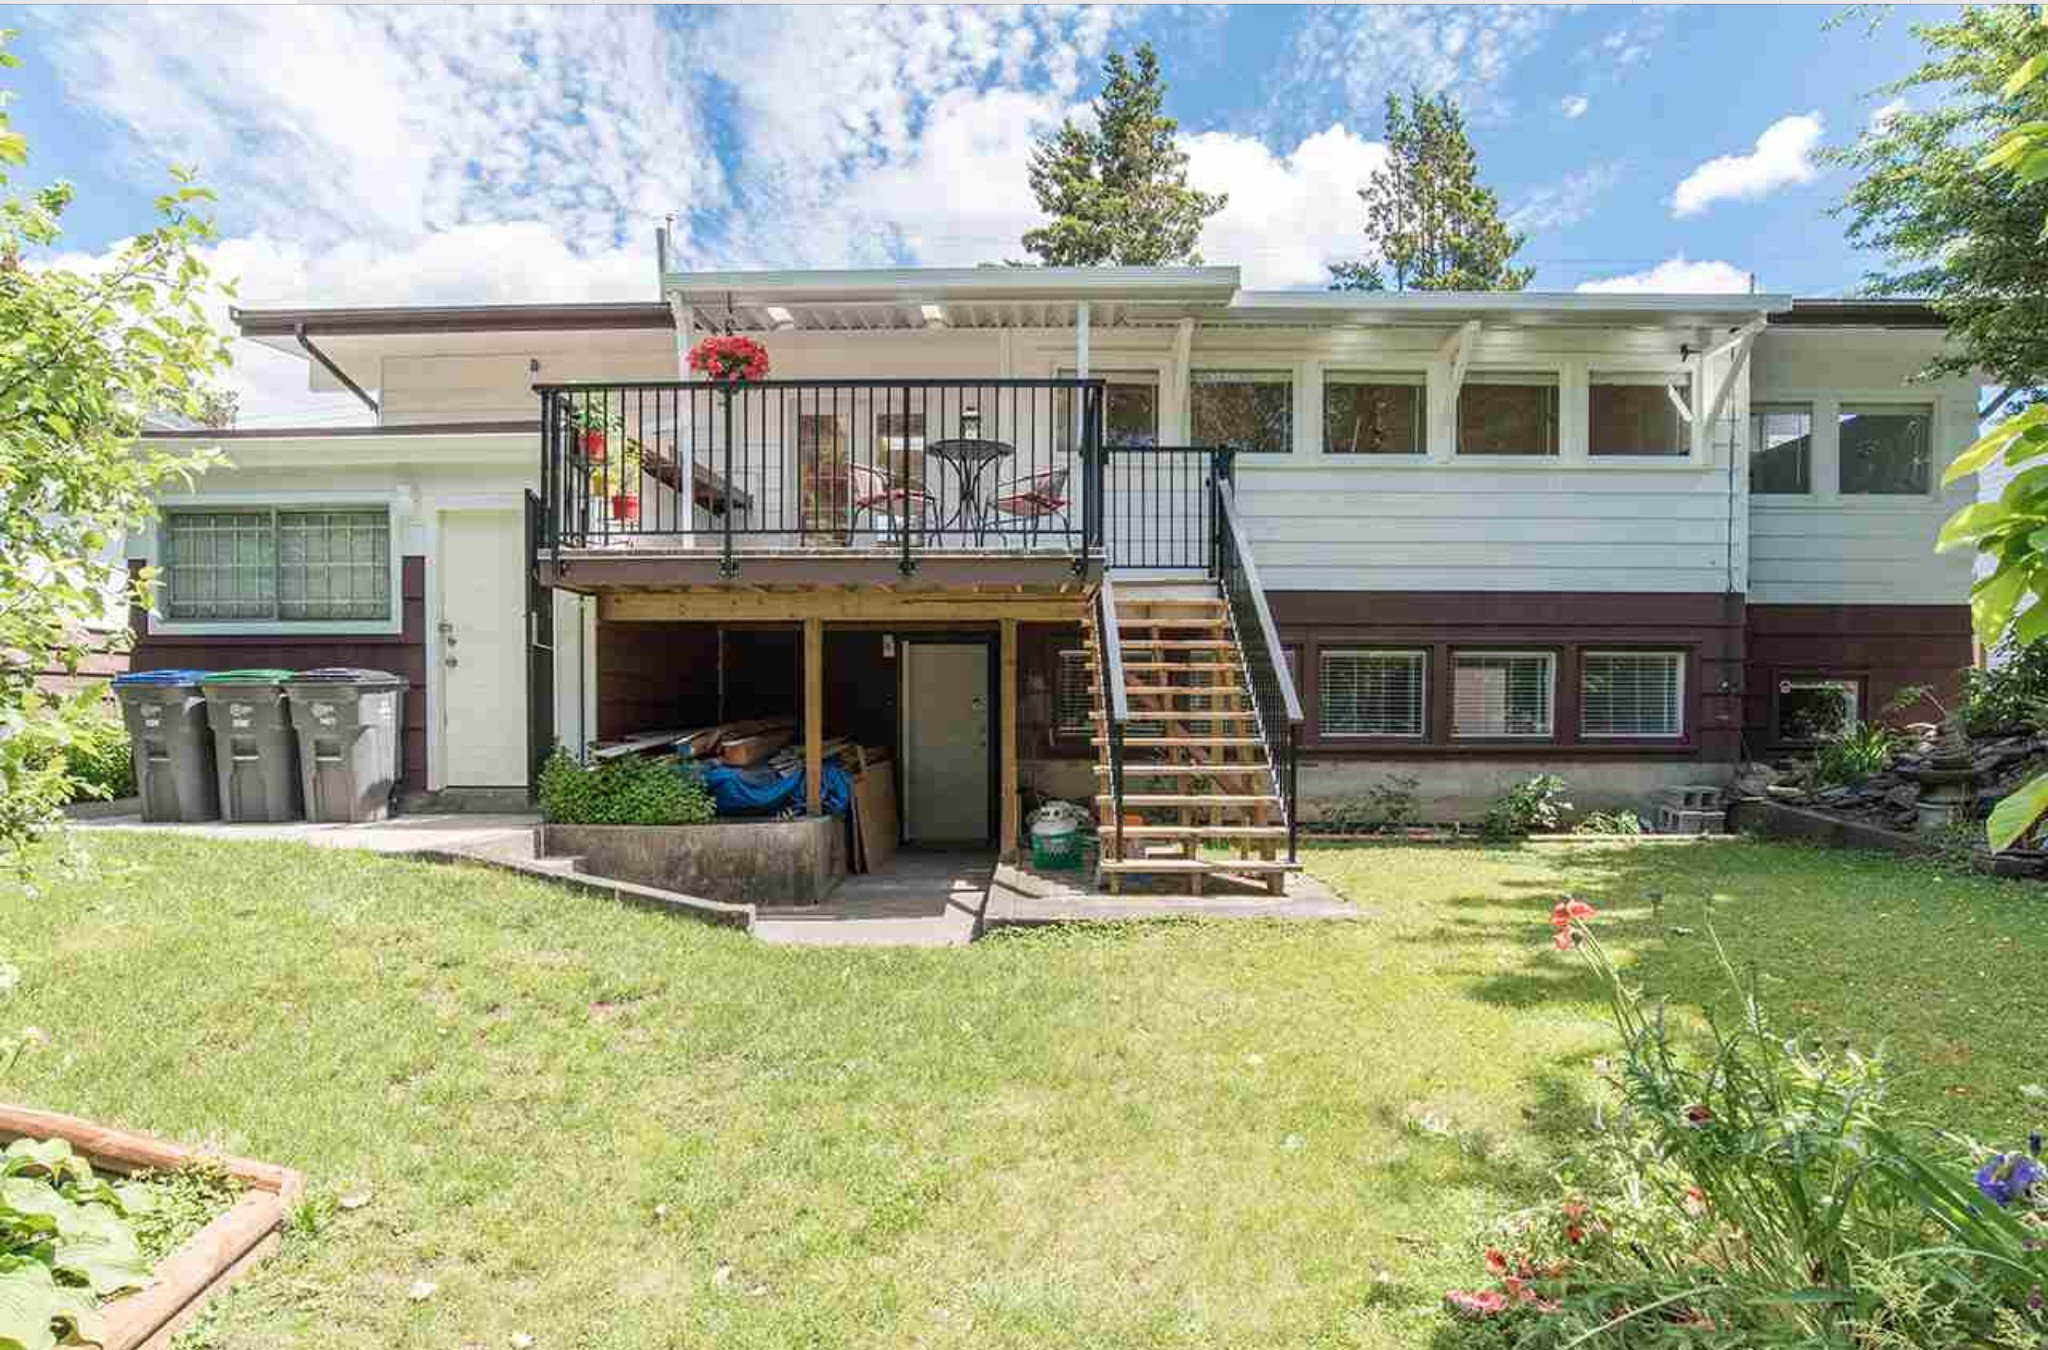 Photo 19: Photos: 10327 127A Street in Surrey: Cedar Hills House for sale : MLS®# R2178137